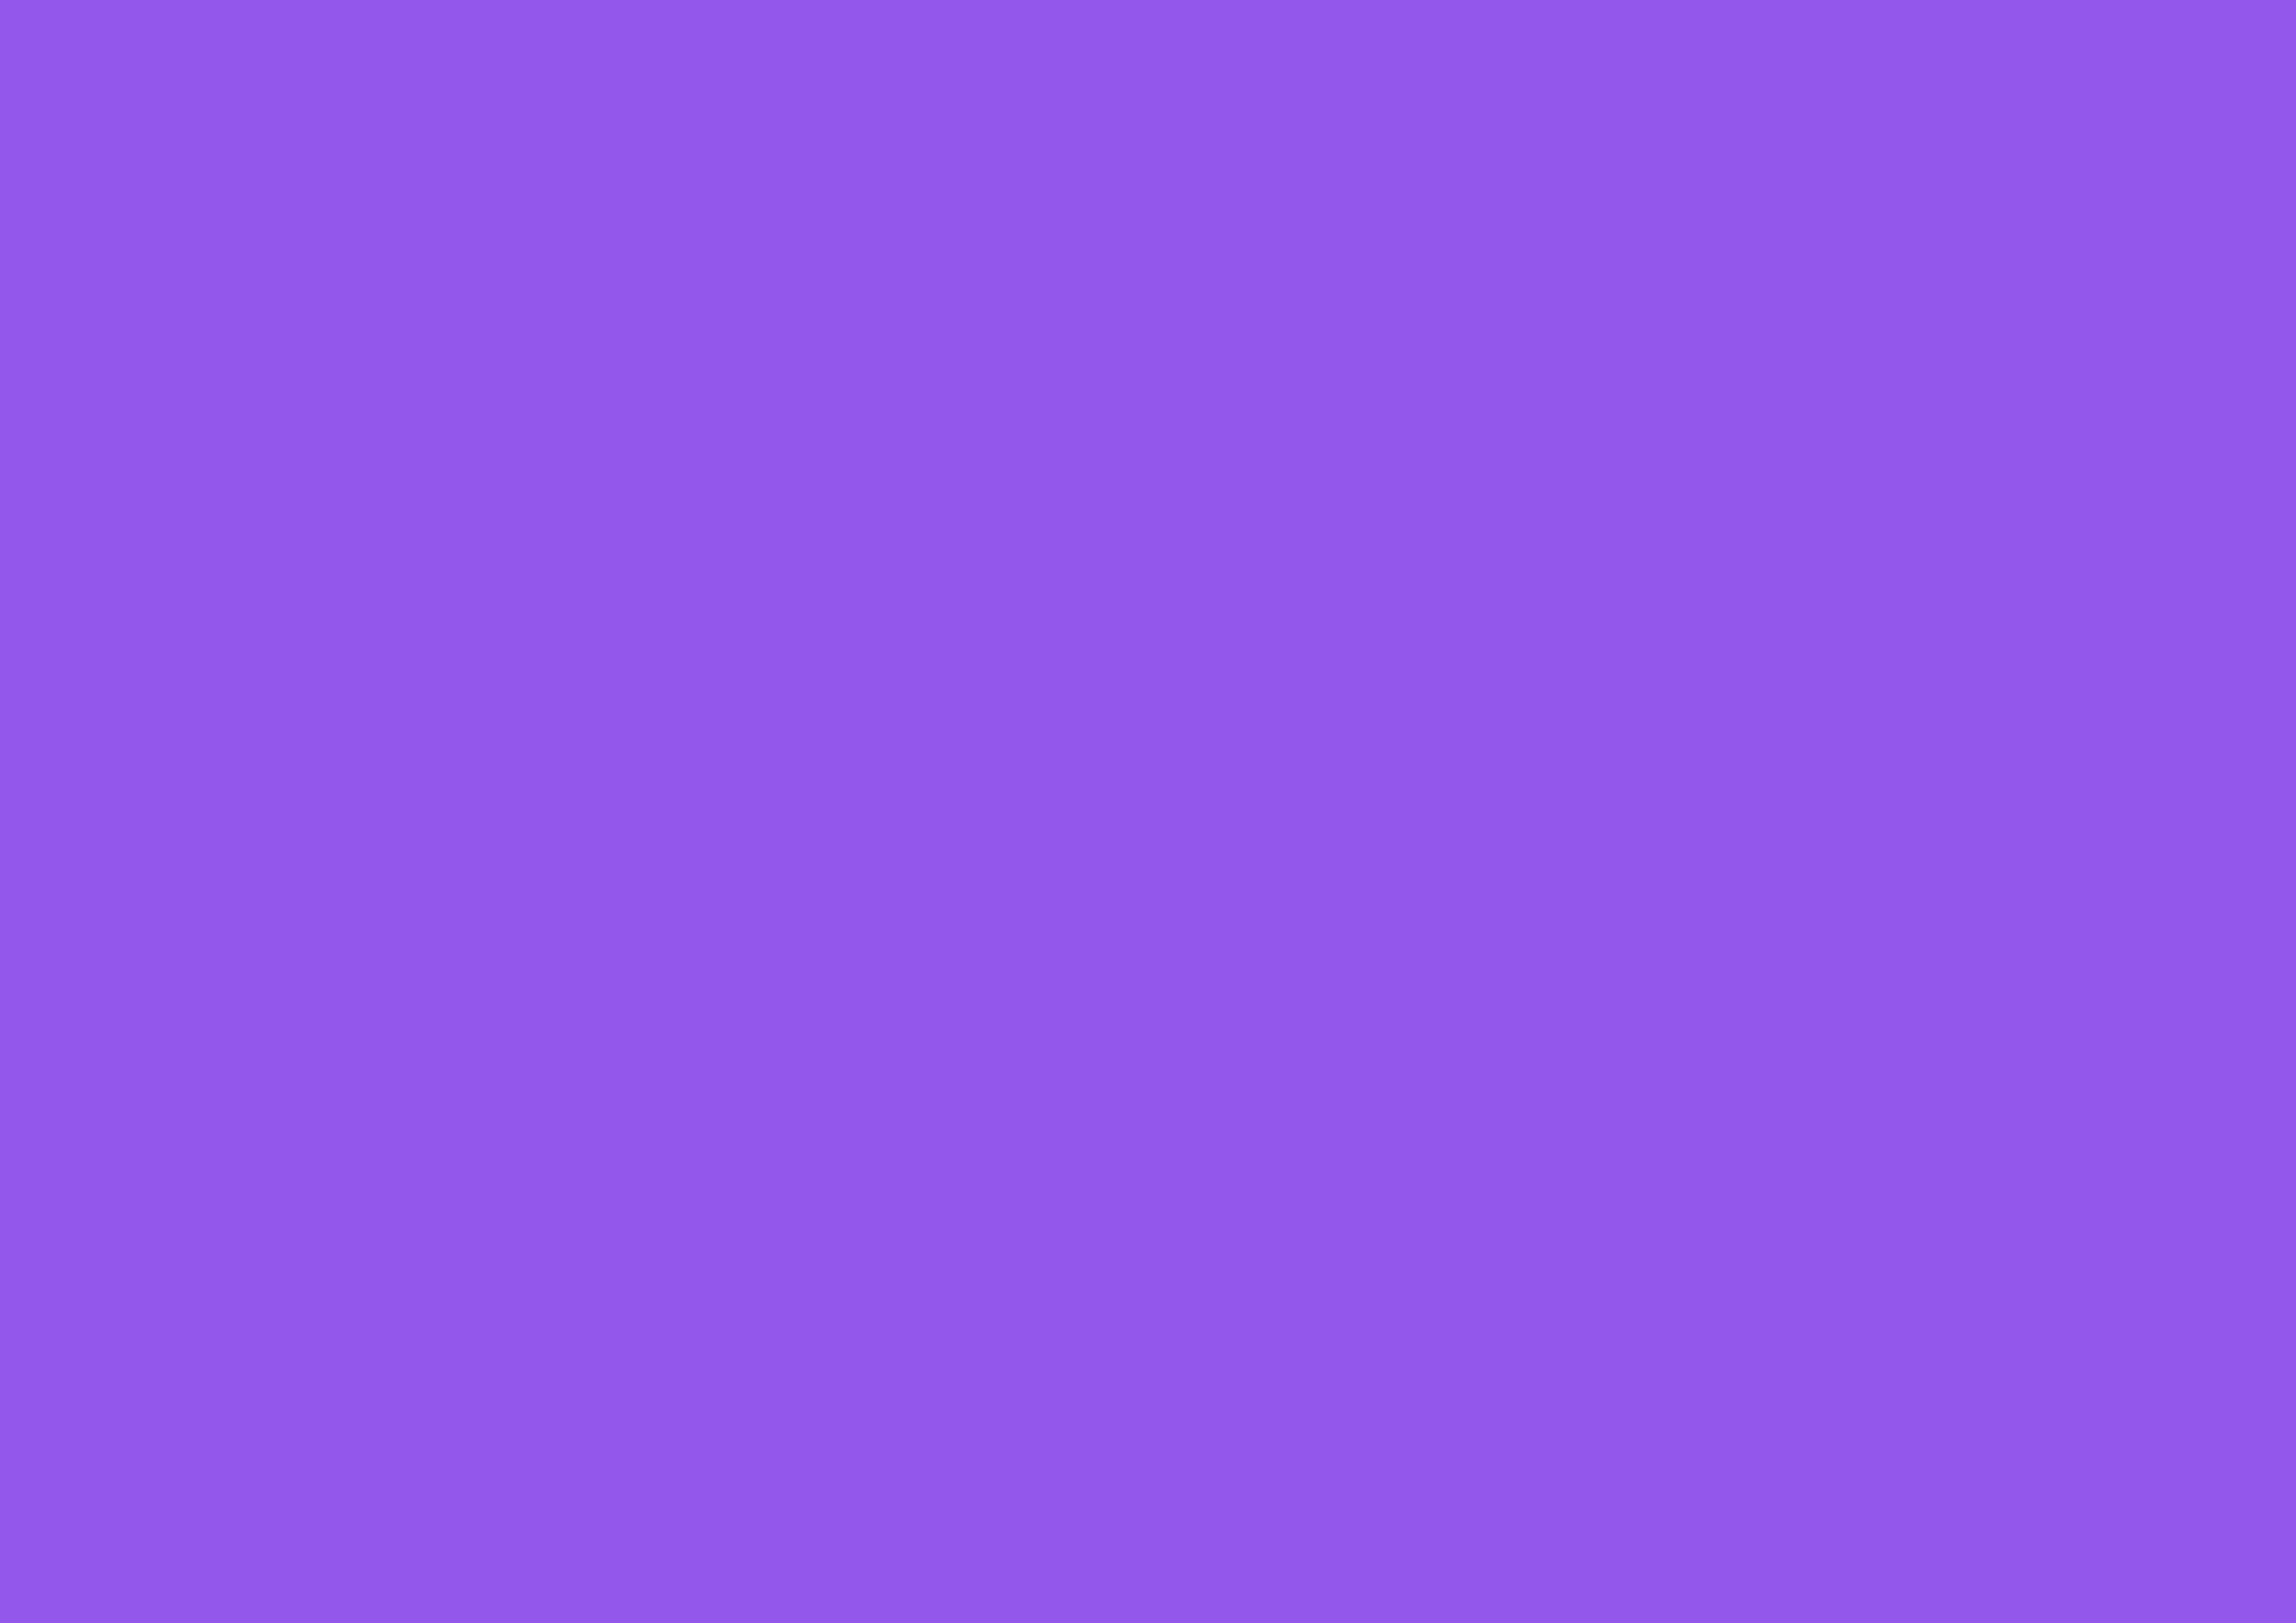 3508x2480 Lavender Indigo Solid Color Background